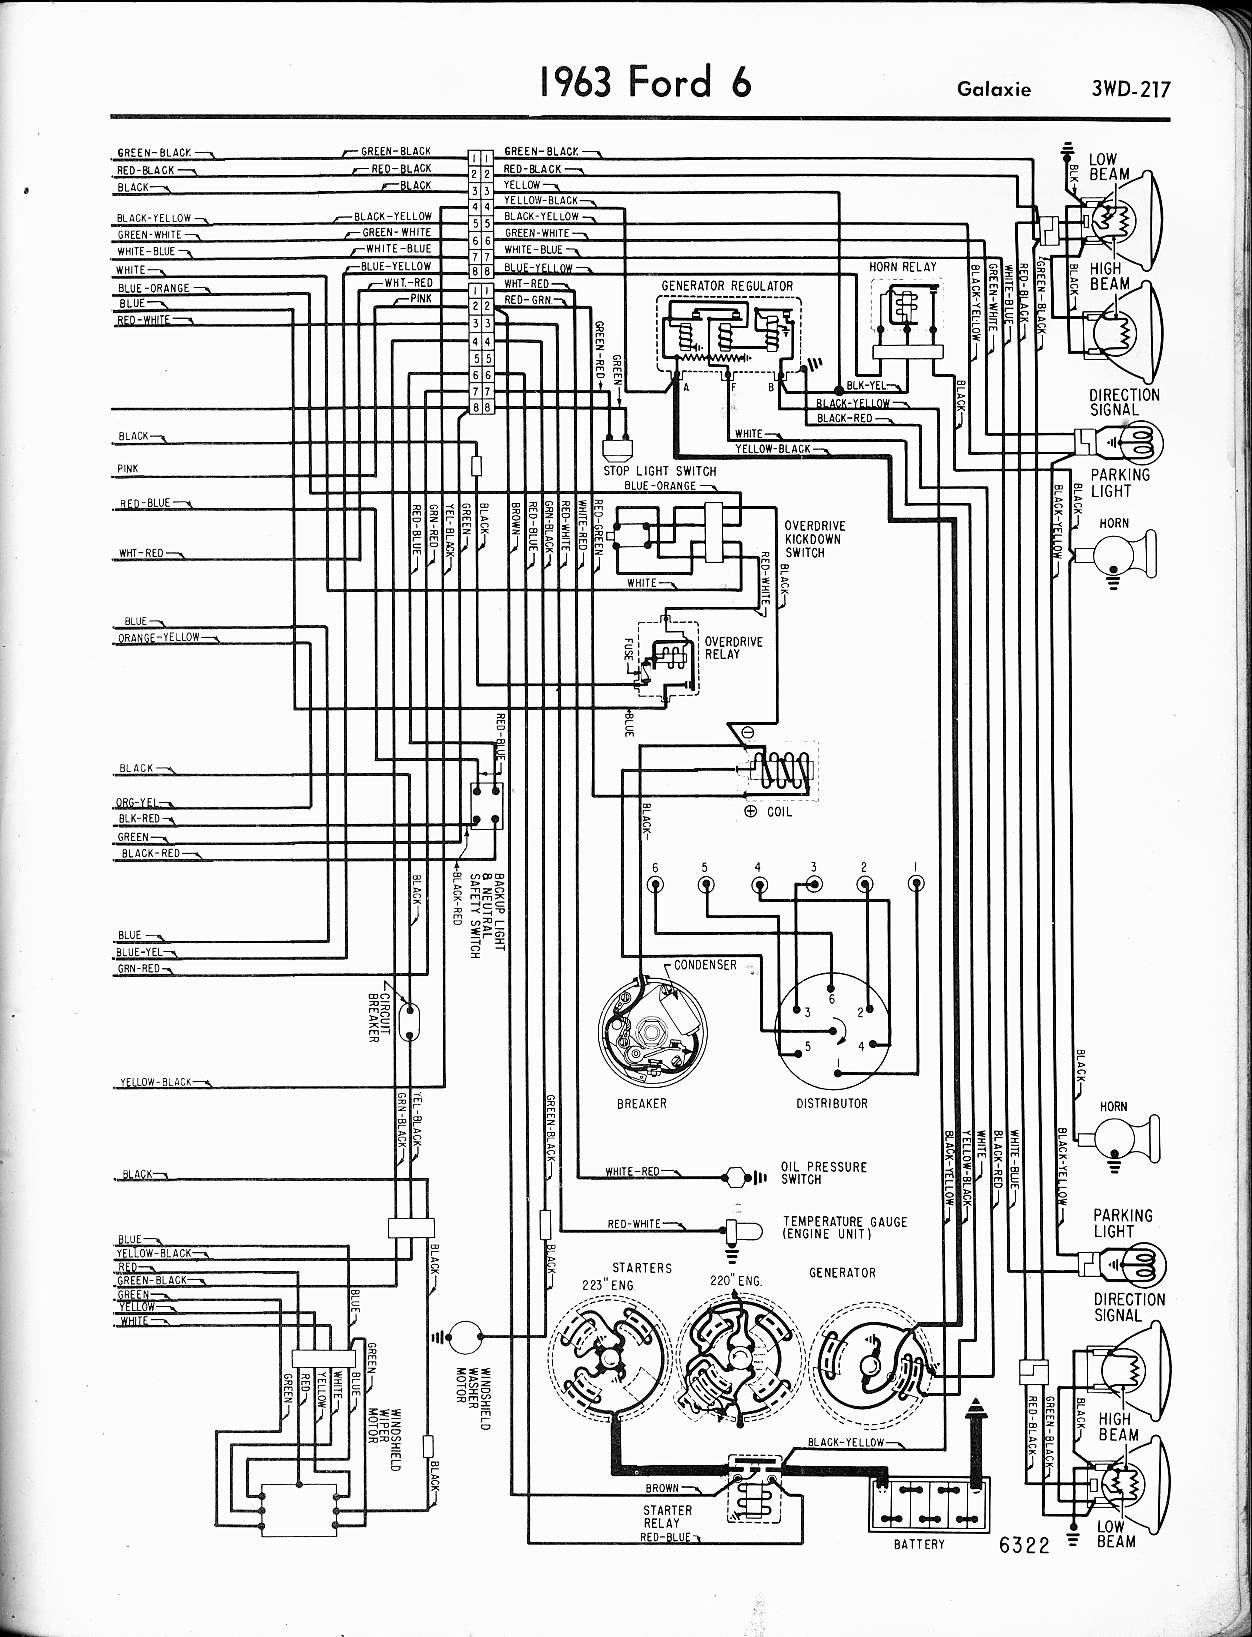 1956 ford turn signal switch